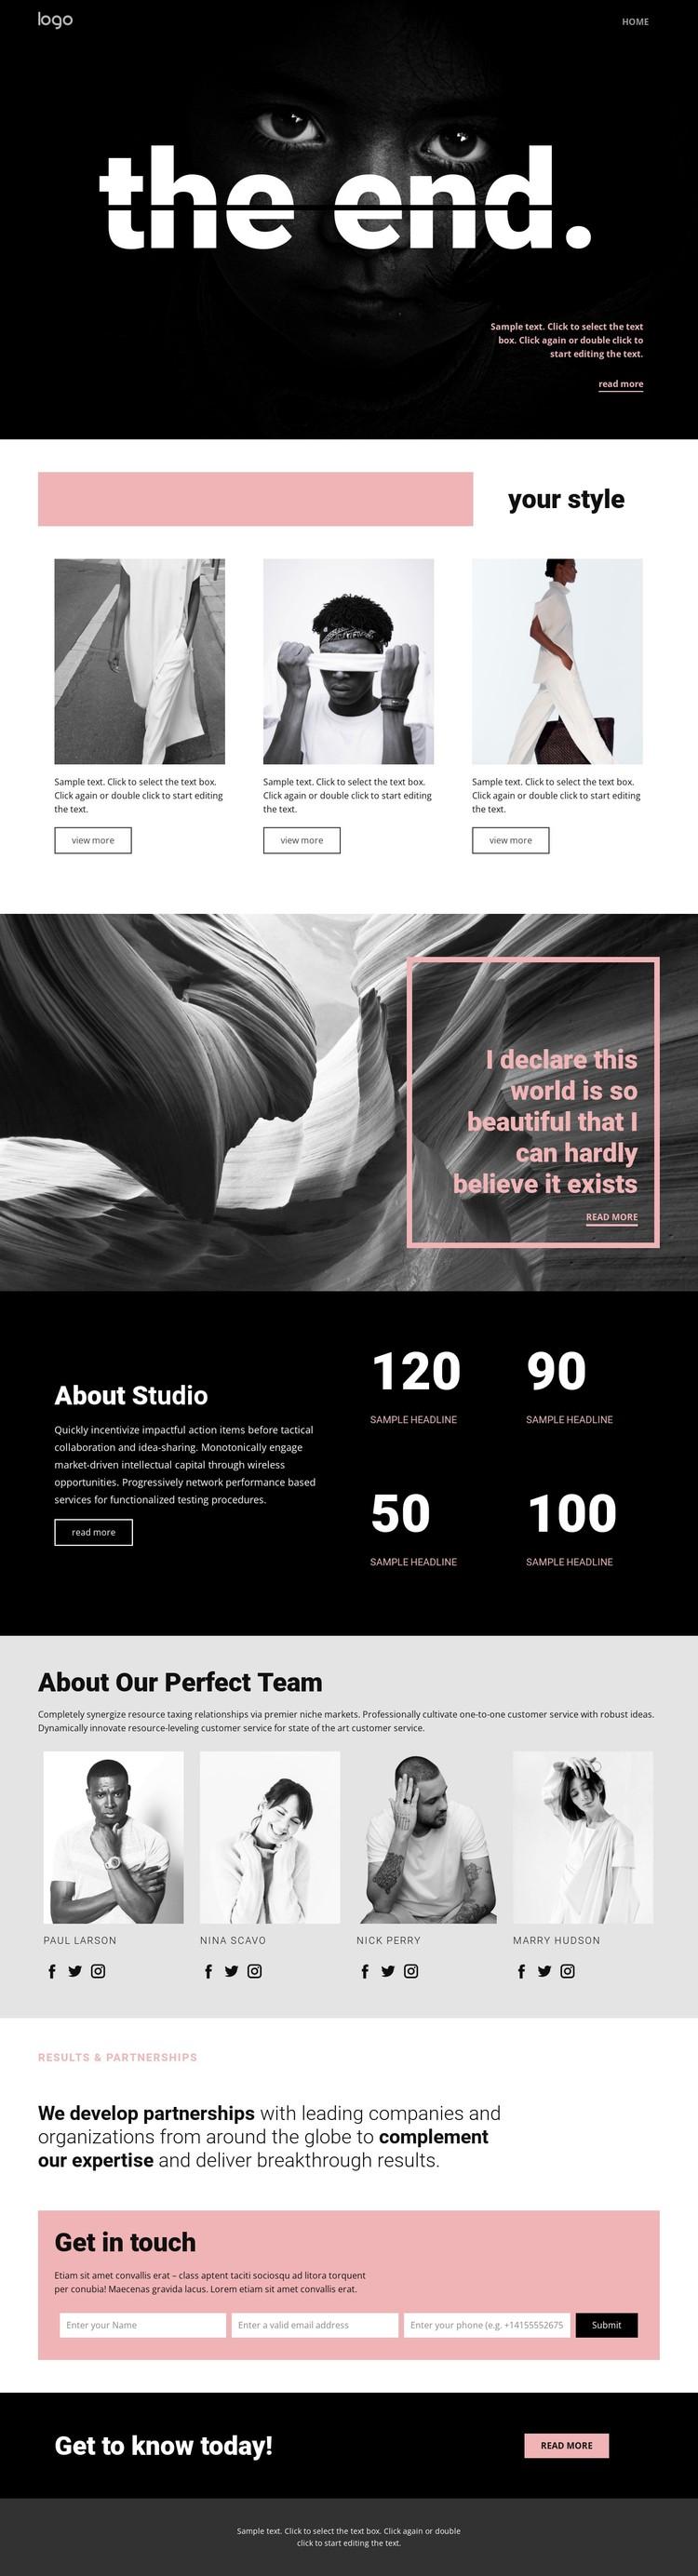 Perfecting styles of art Static Site Generator